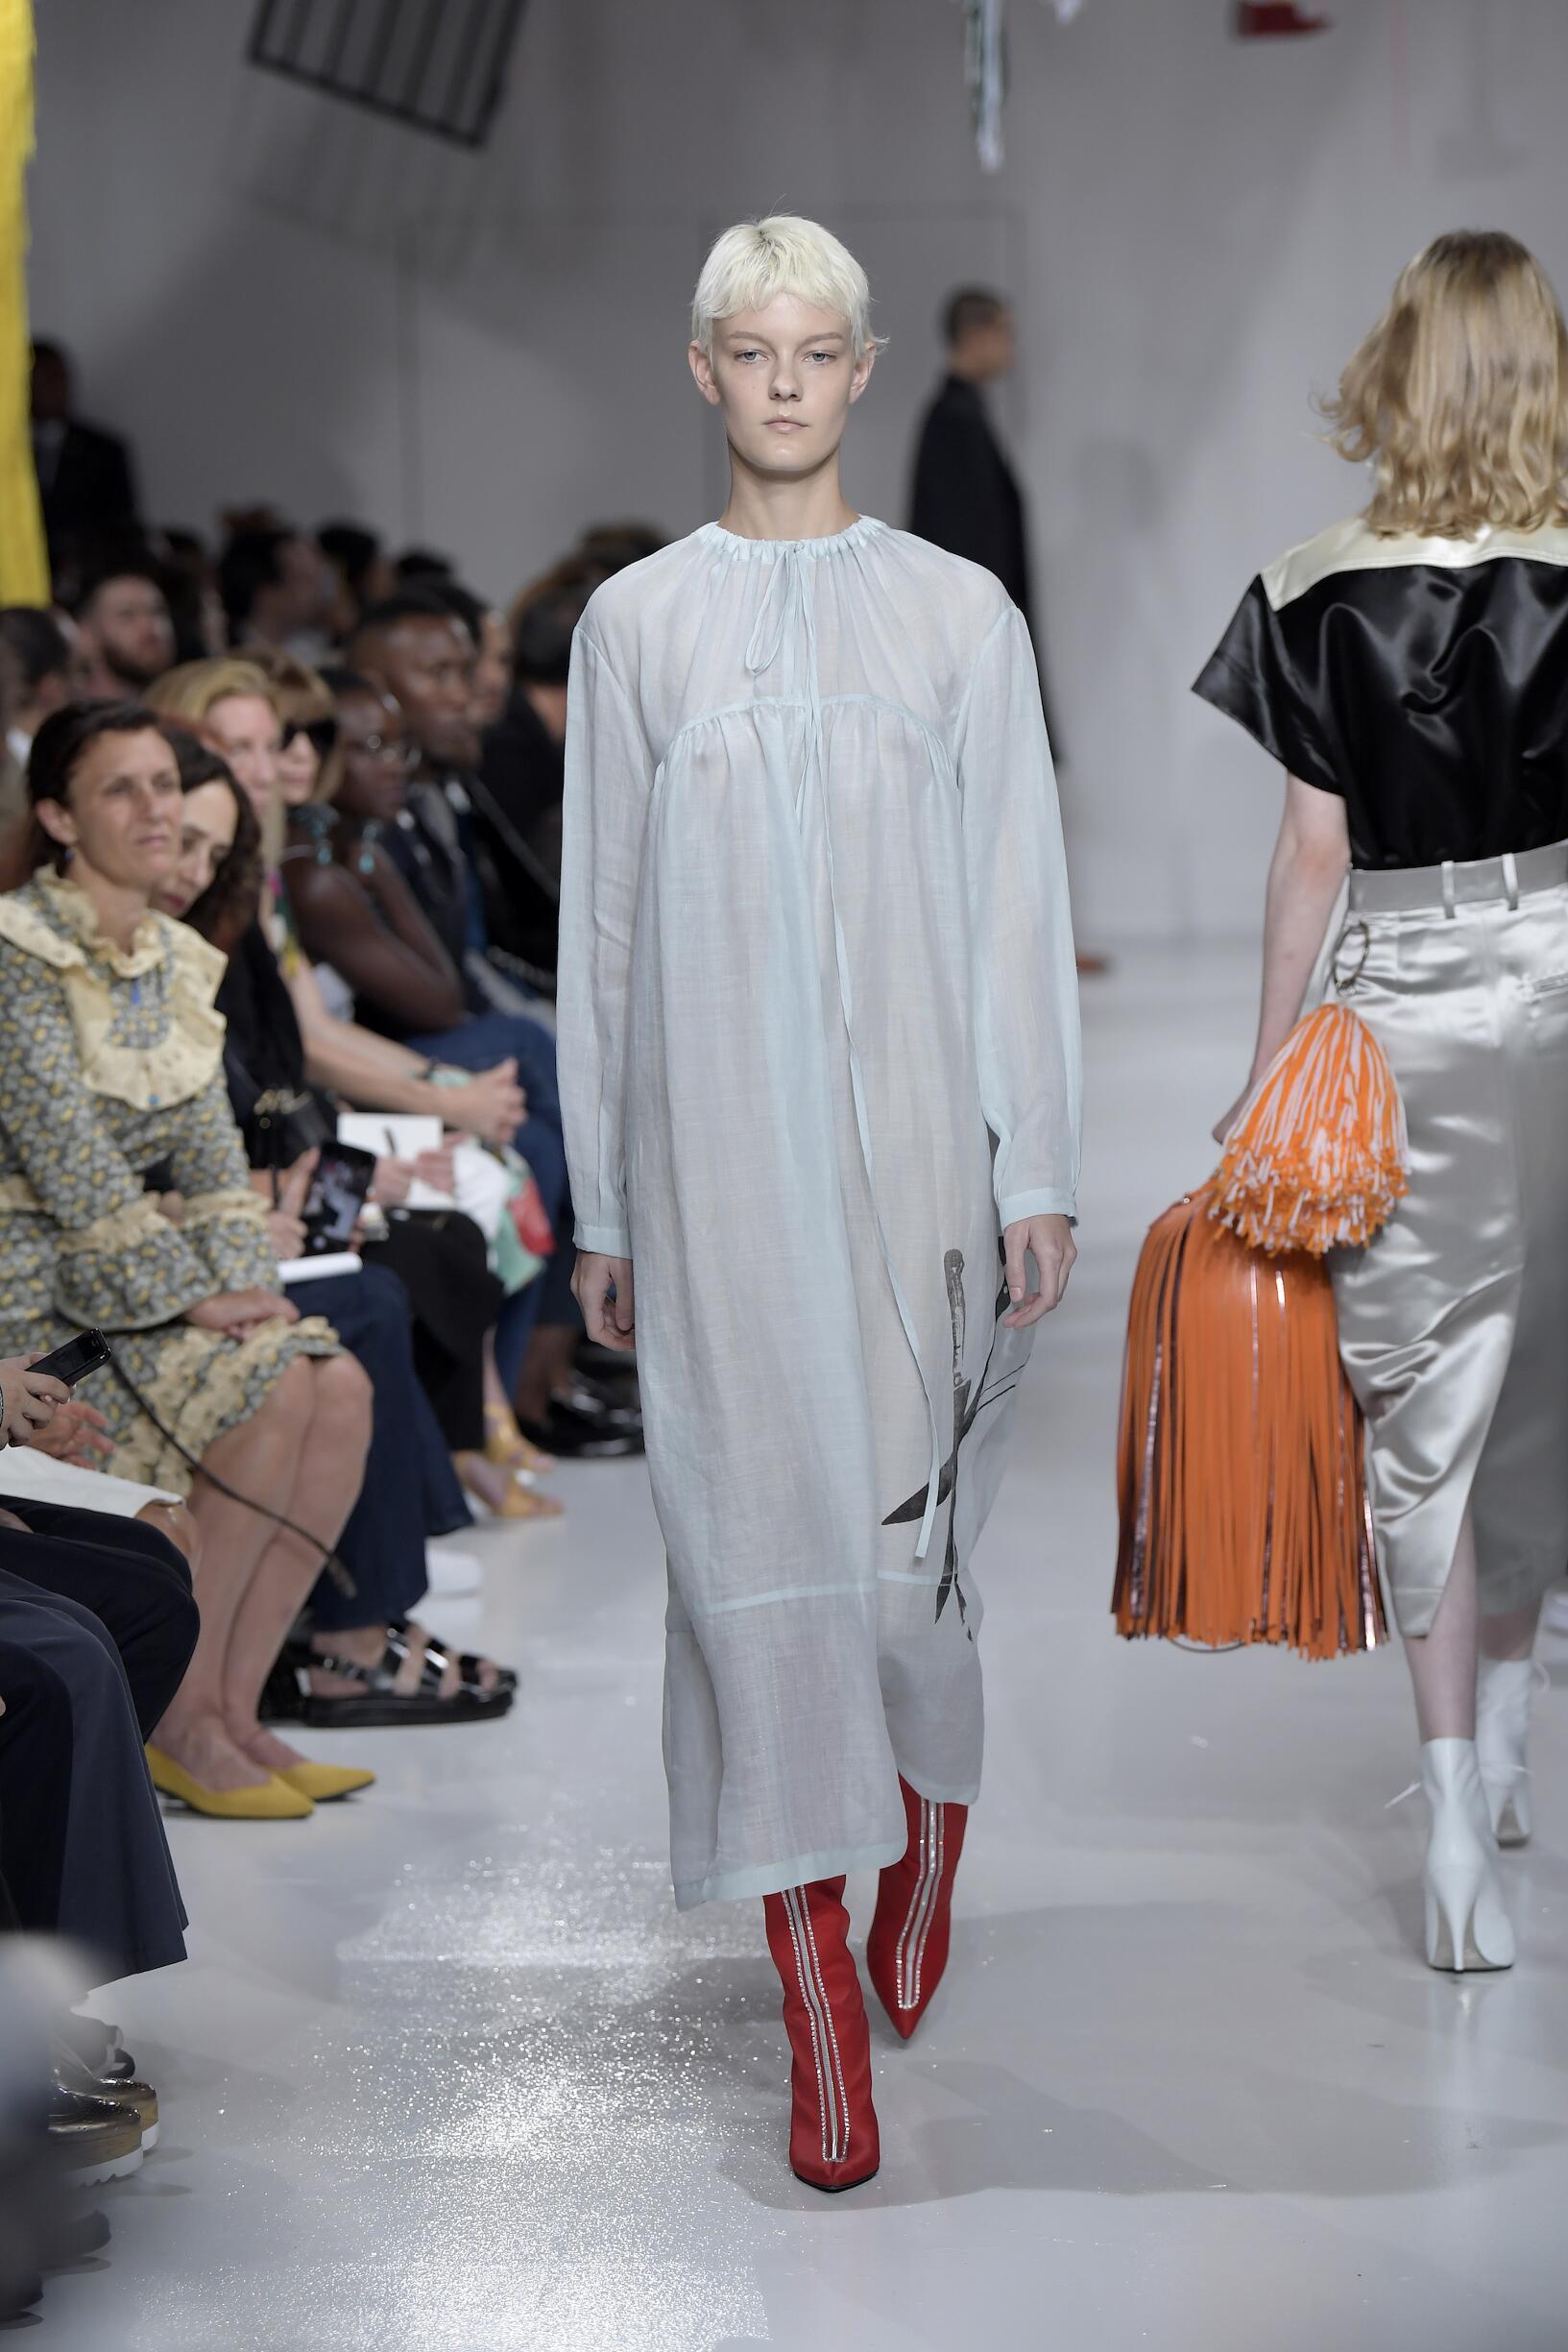 Fashion Model Calvin Klein 205W39NYC Catwalk